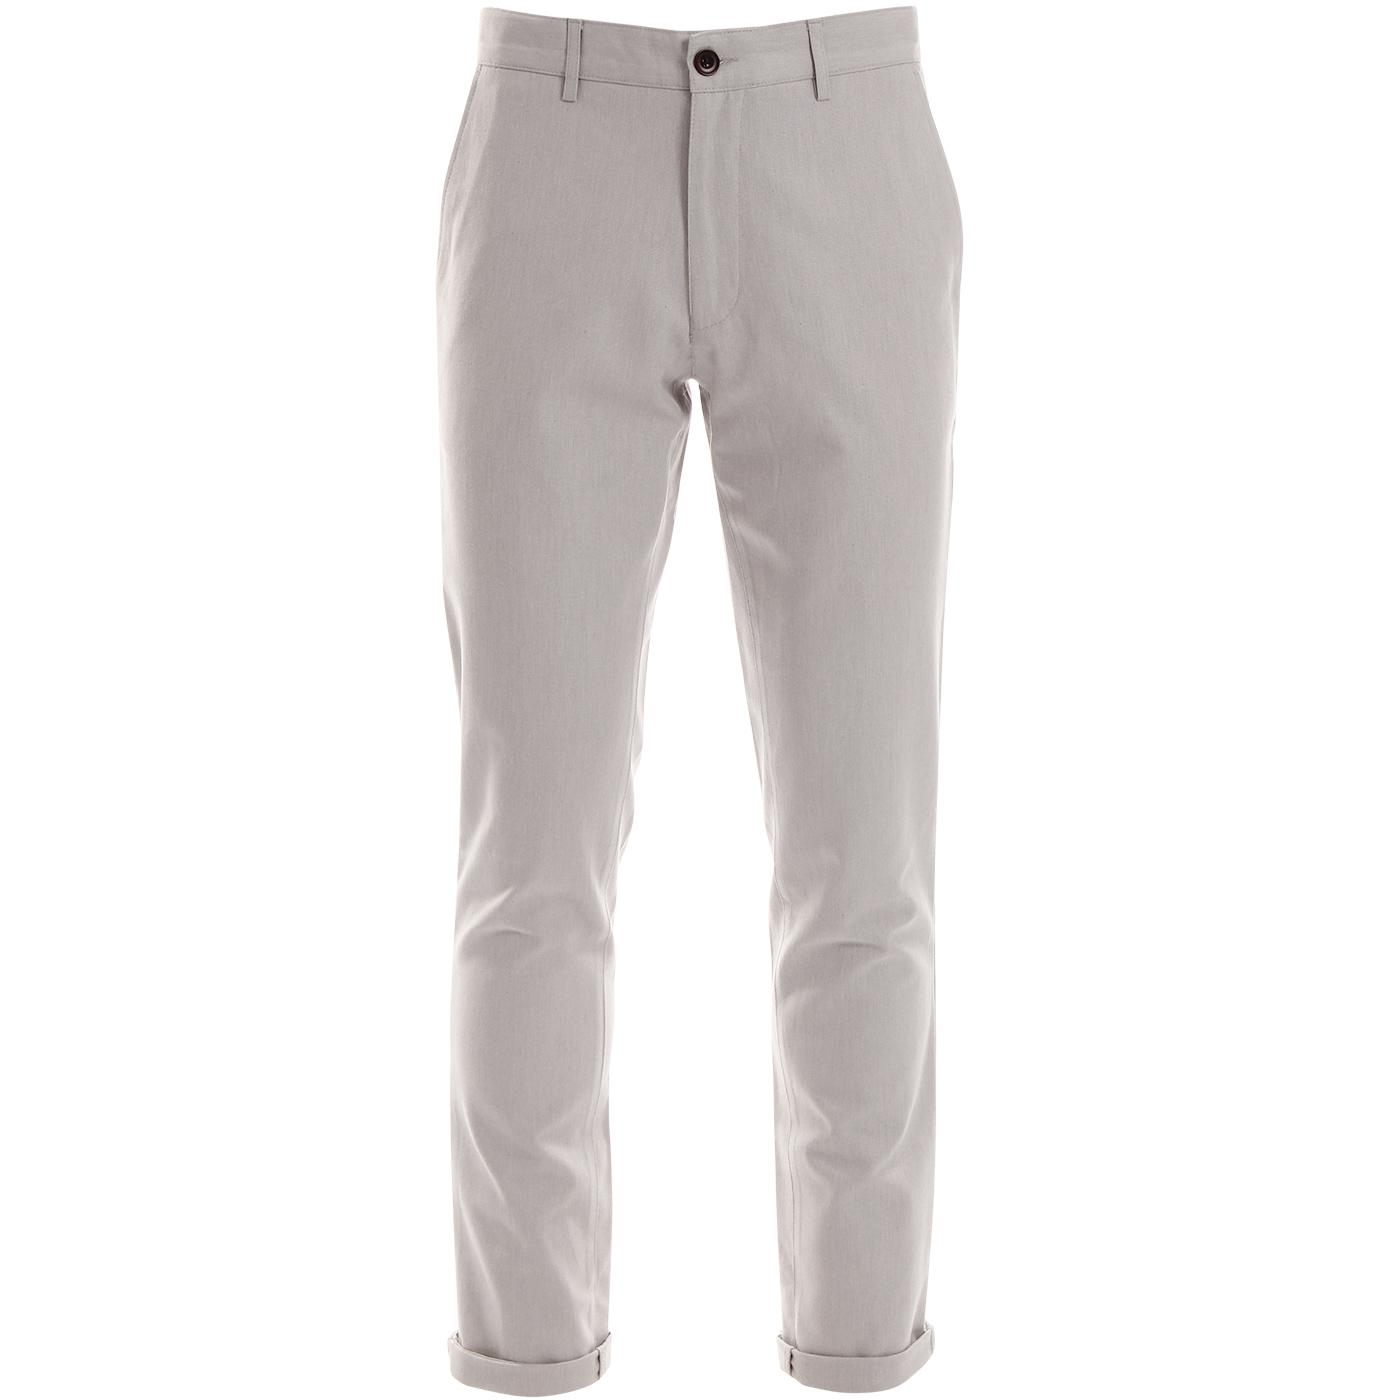 Elm FARAH Retro Mod Slim Hopsack Trouser Grey Mist